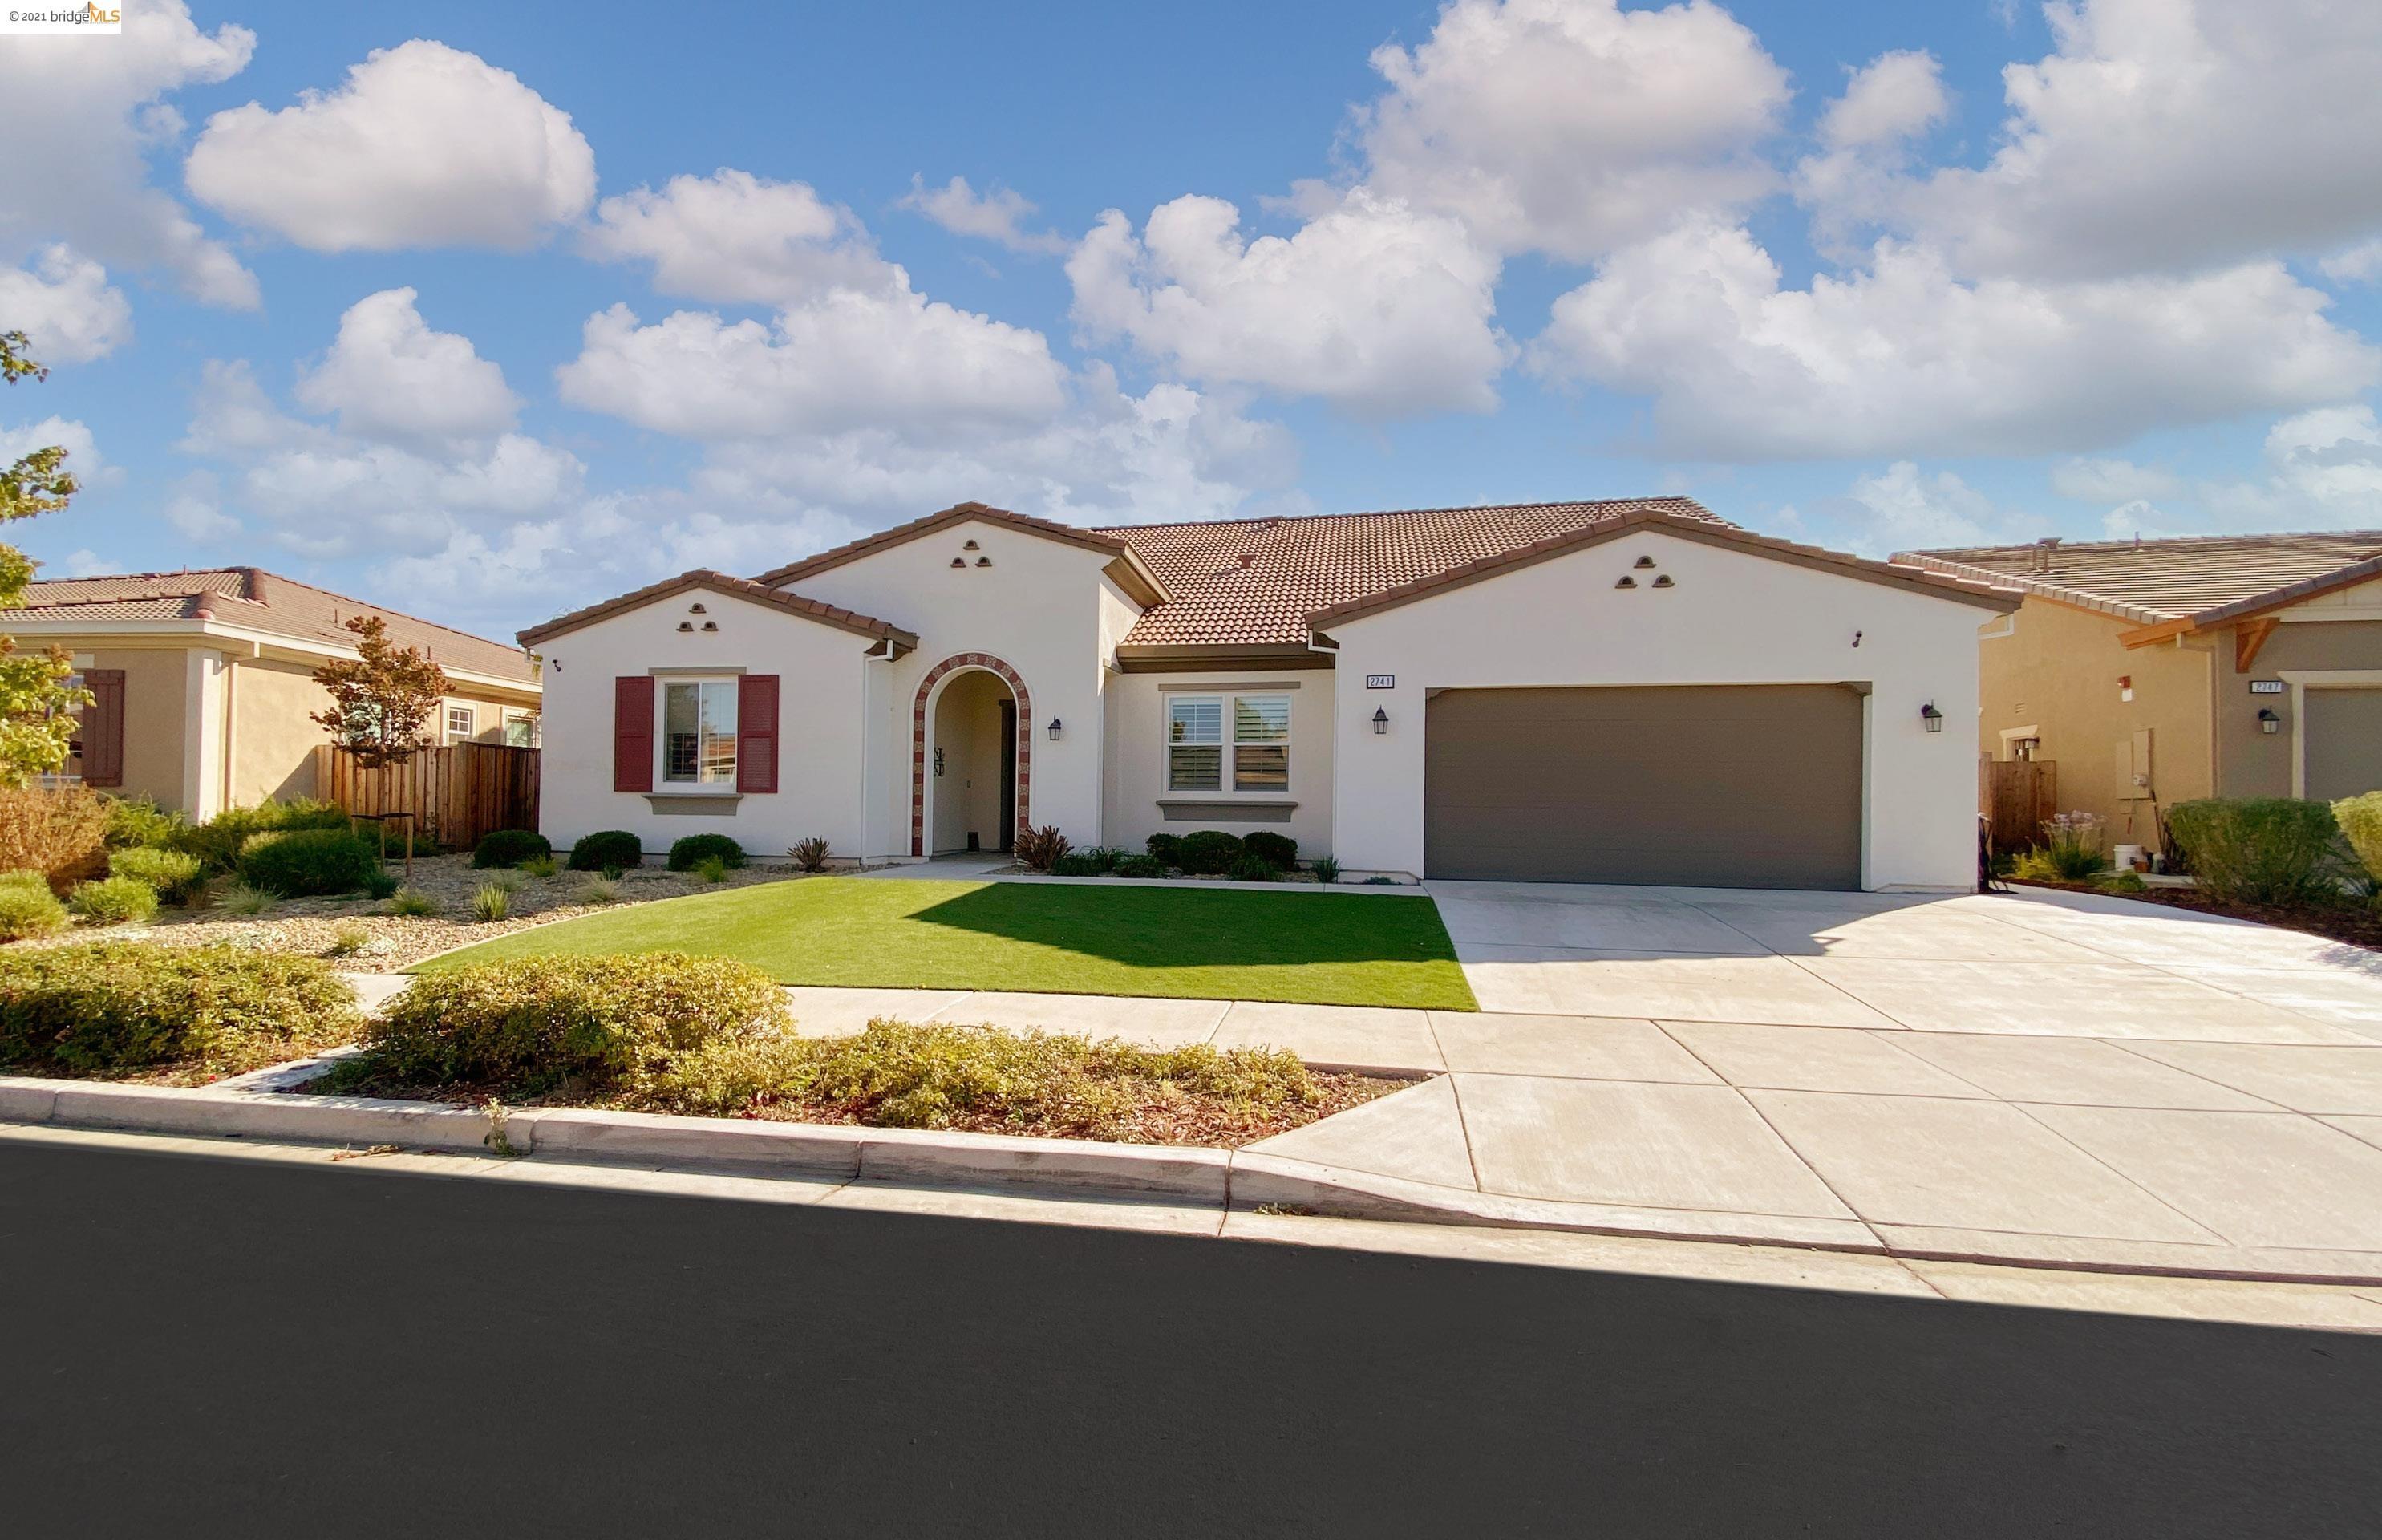 2741 Manresa Shore Ln, OAKLEY, CA 94561